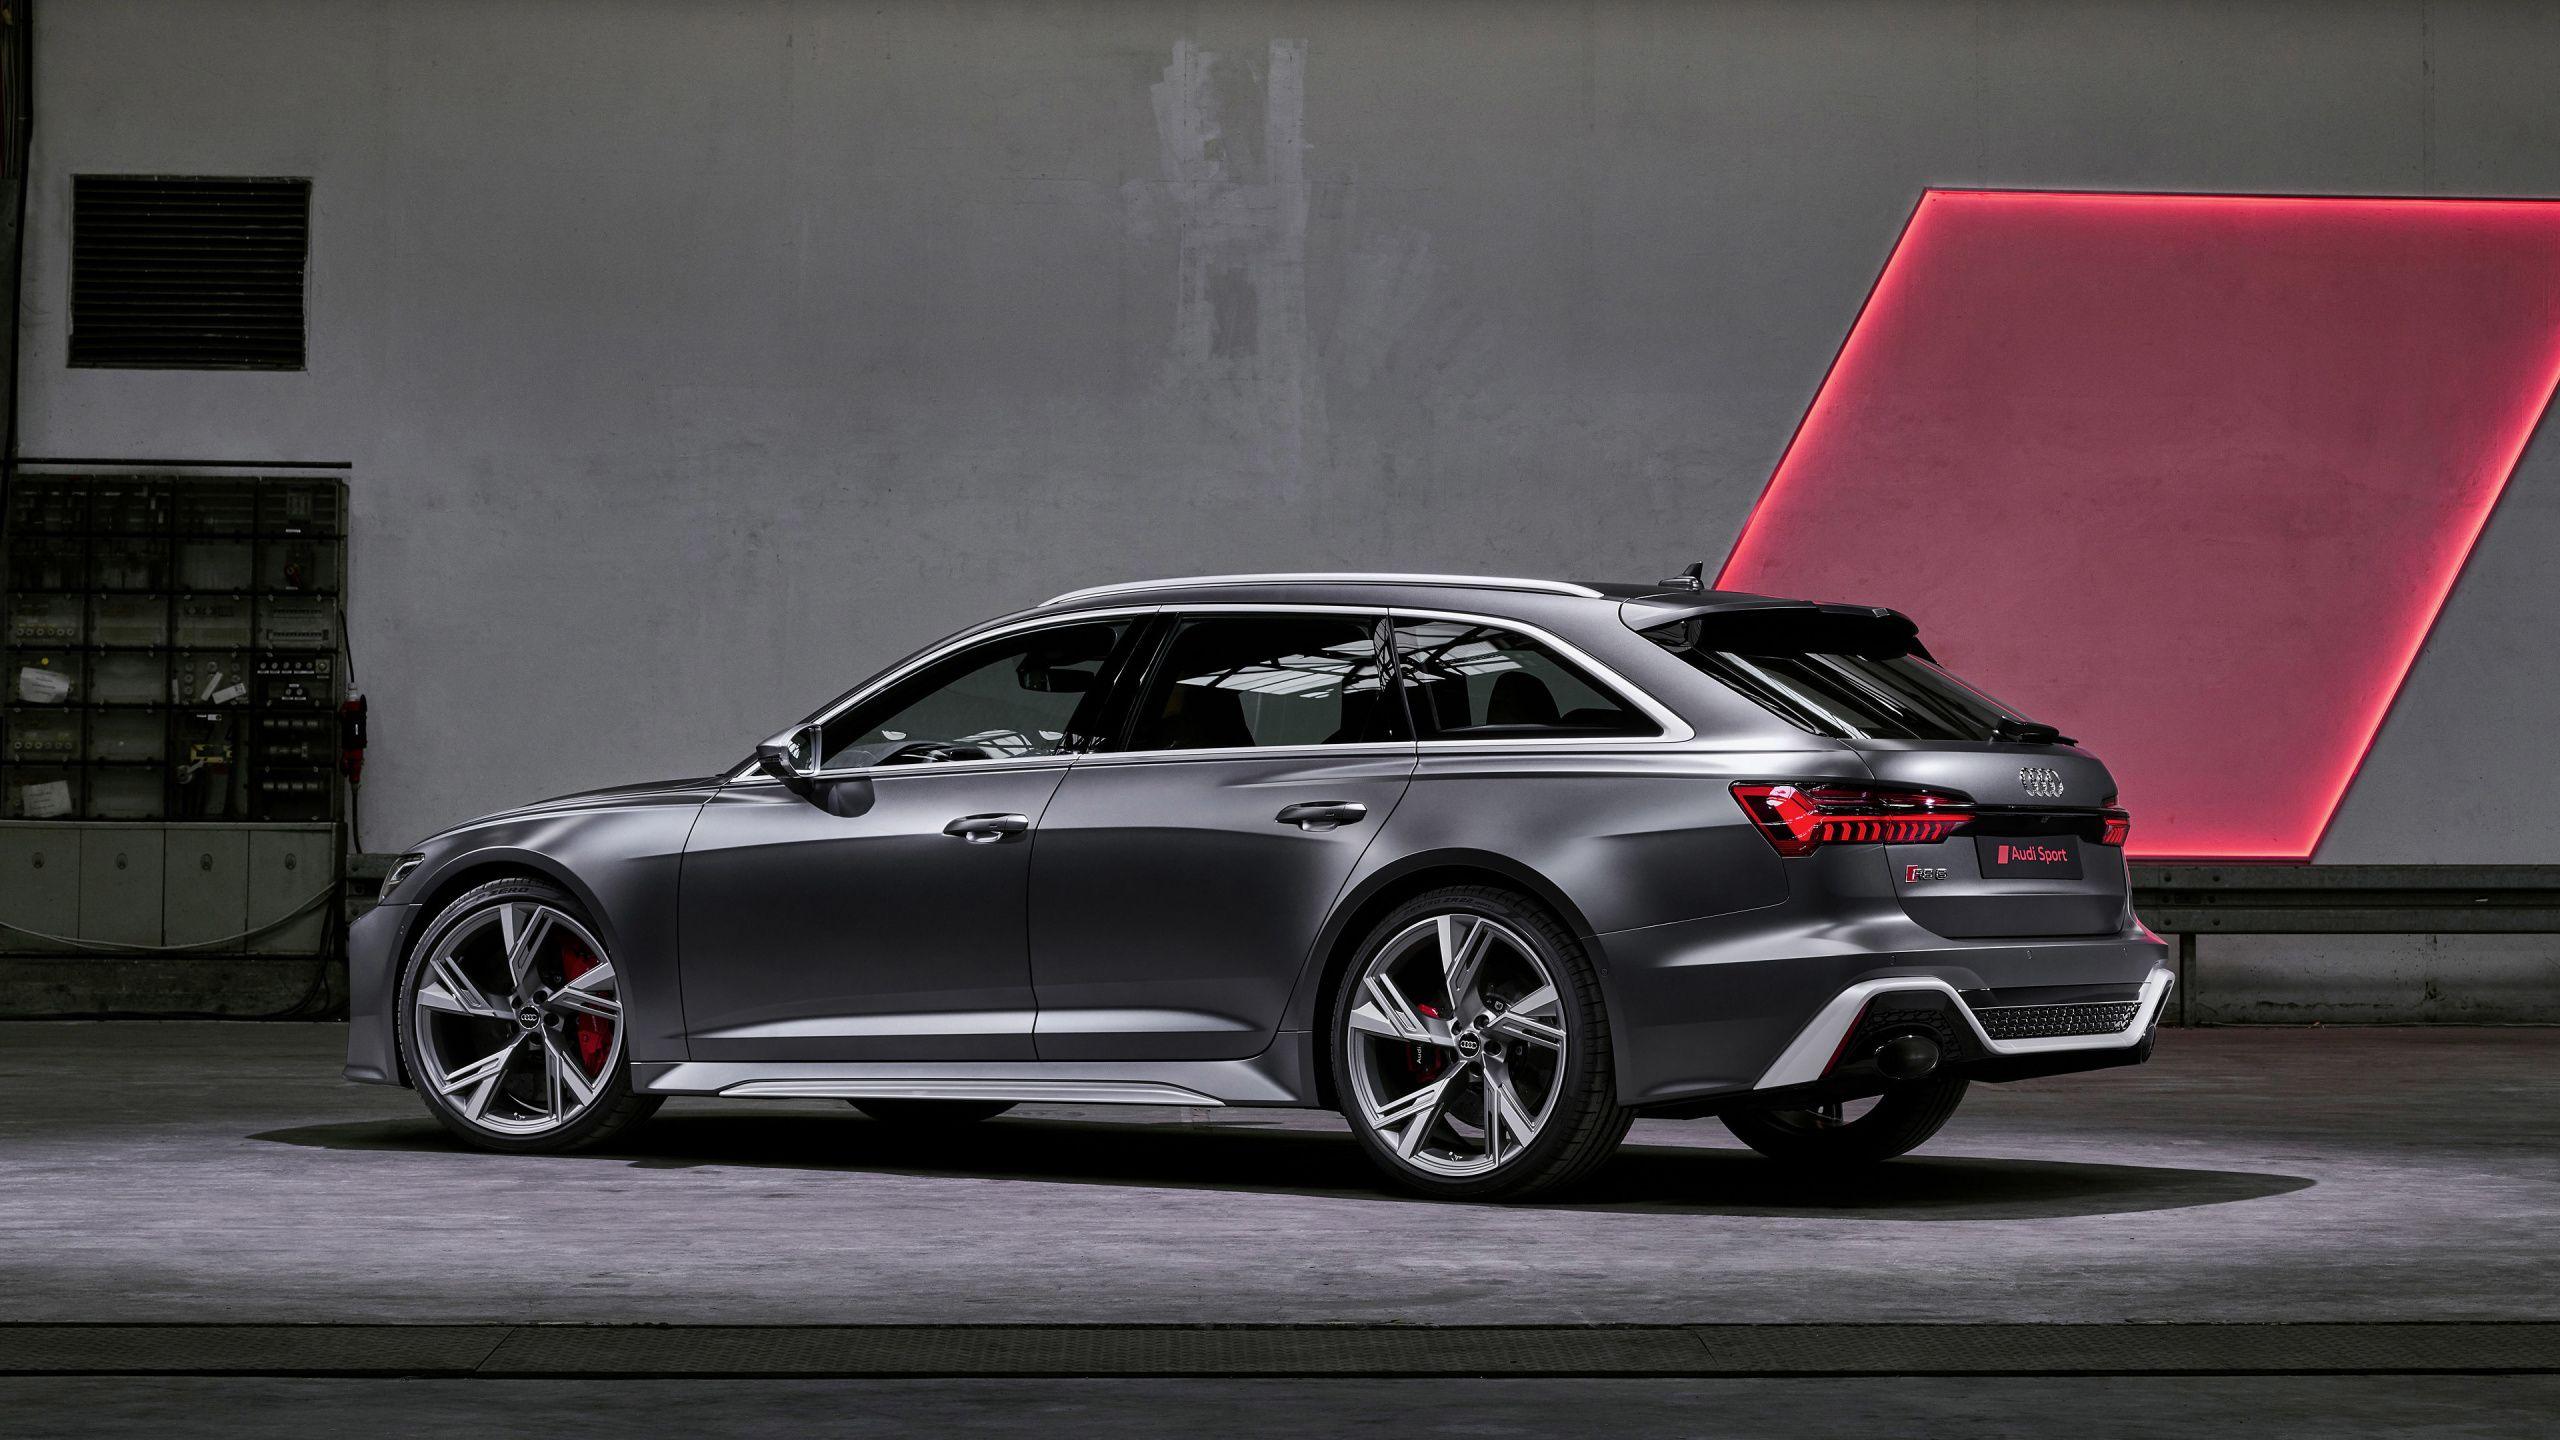 2560x1440 Audi Rs6 Avant Compact Suv Wallpaper Audi Rs6 Audi